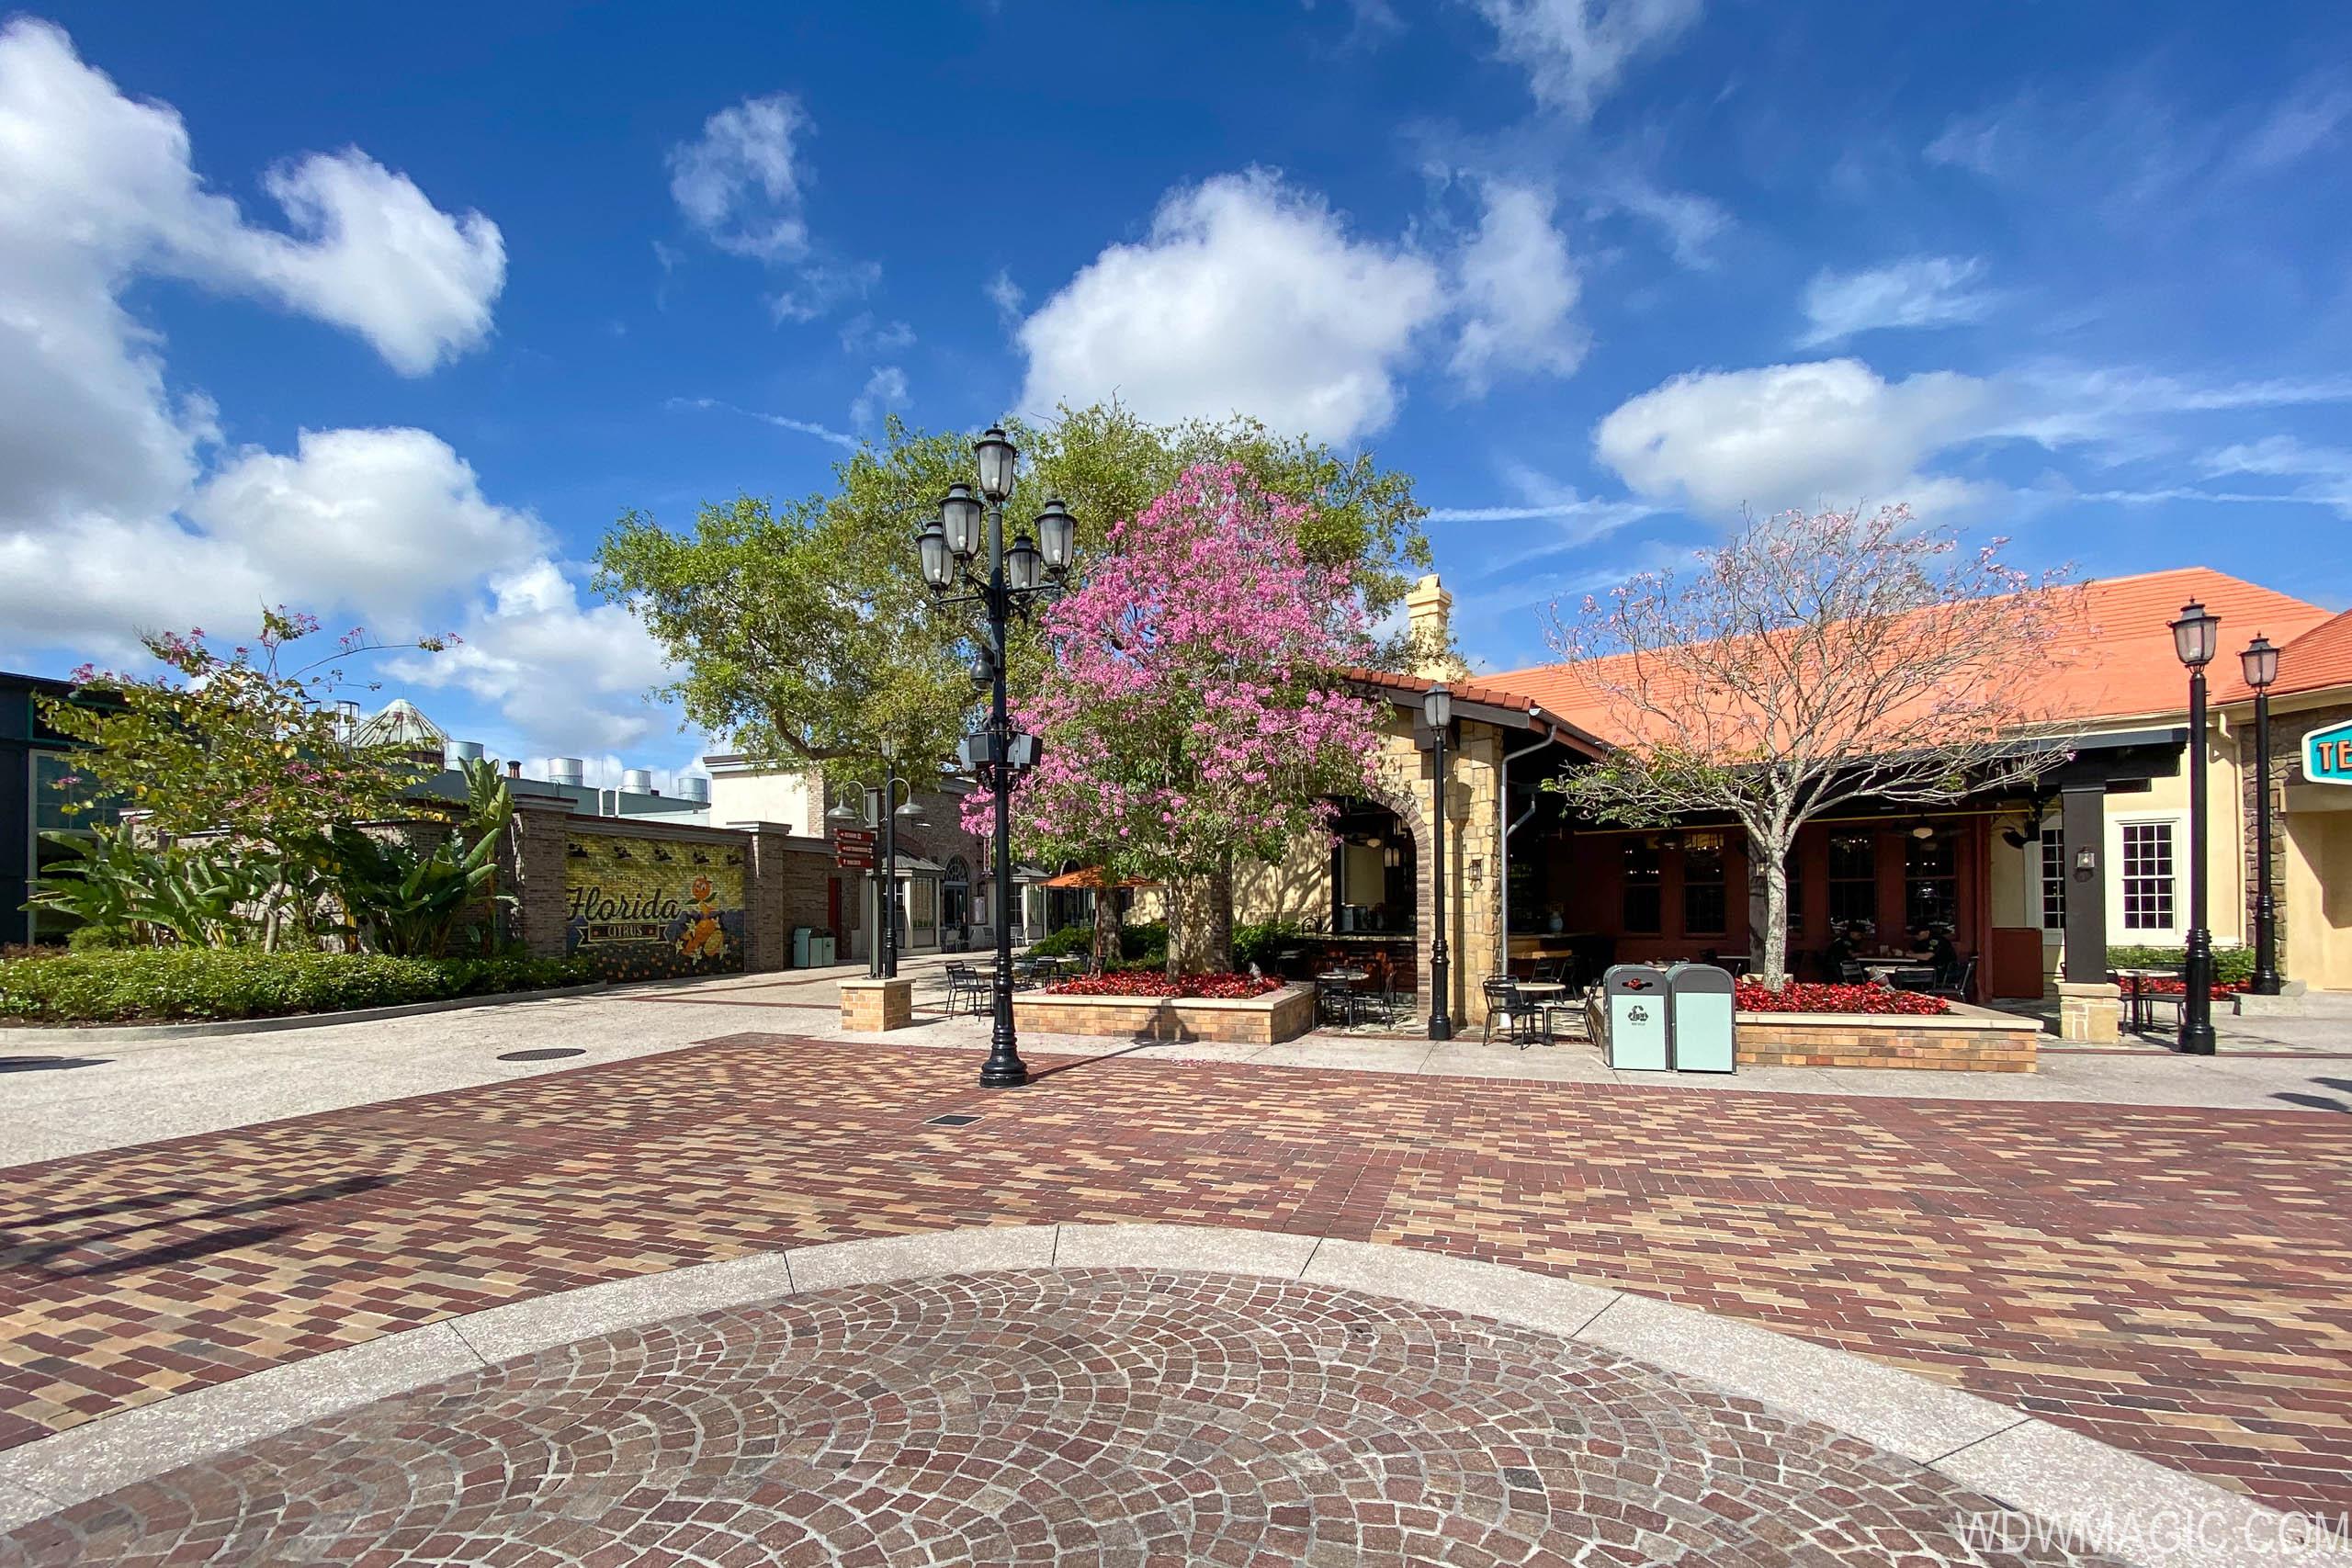 Disney Springs during coronavirus closure March 17 2020